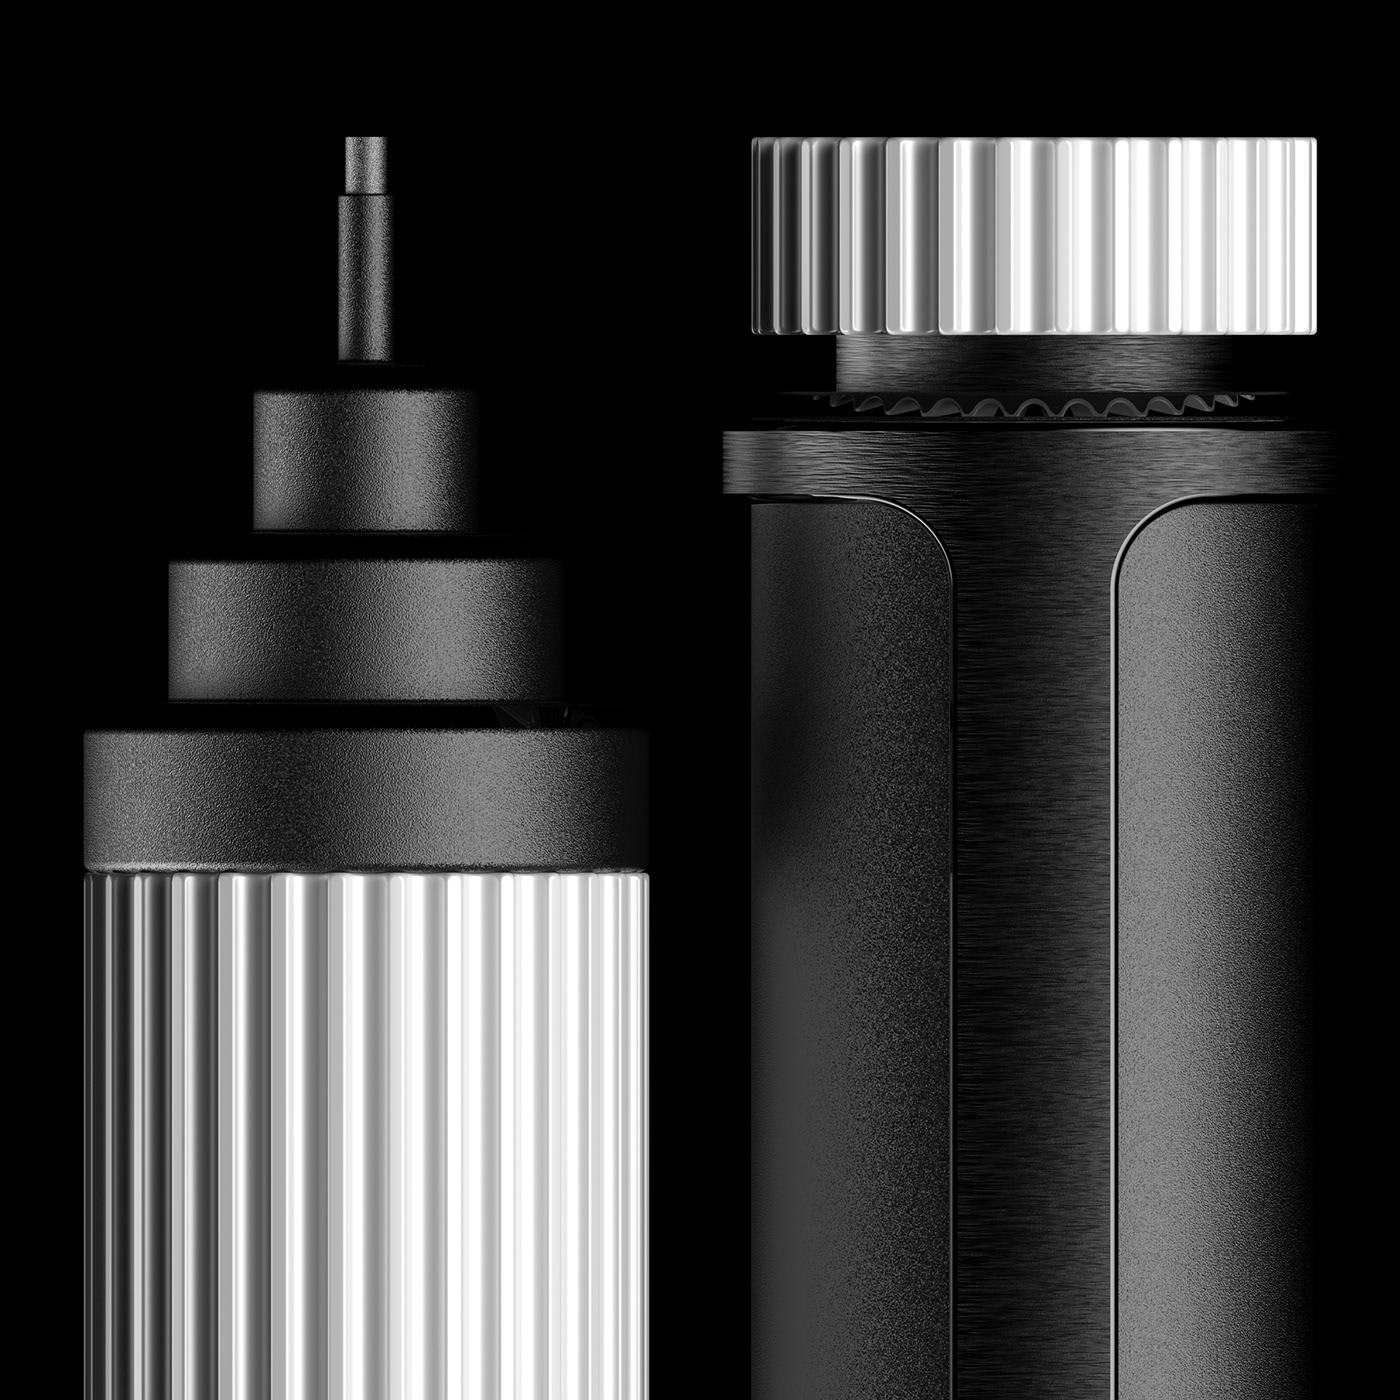 concept Consumer electronic design details earphones industrial design  monochrome product product design  watch